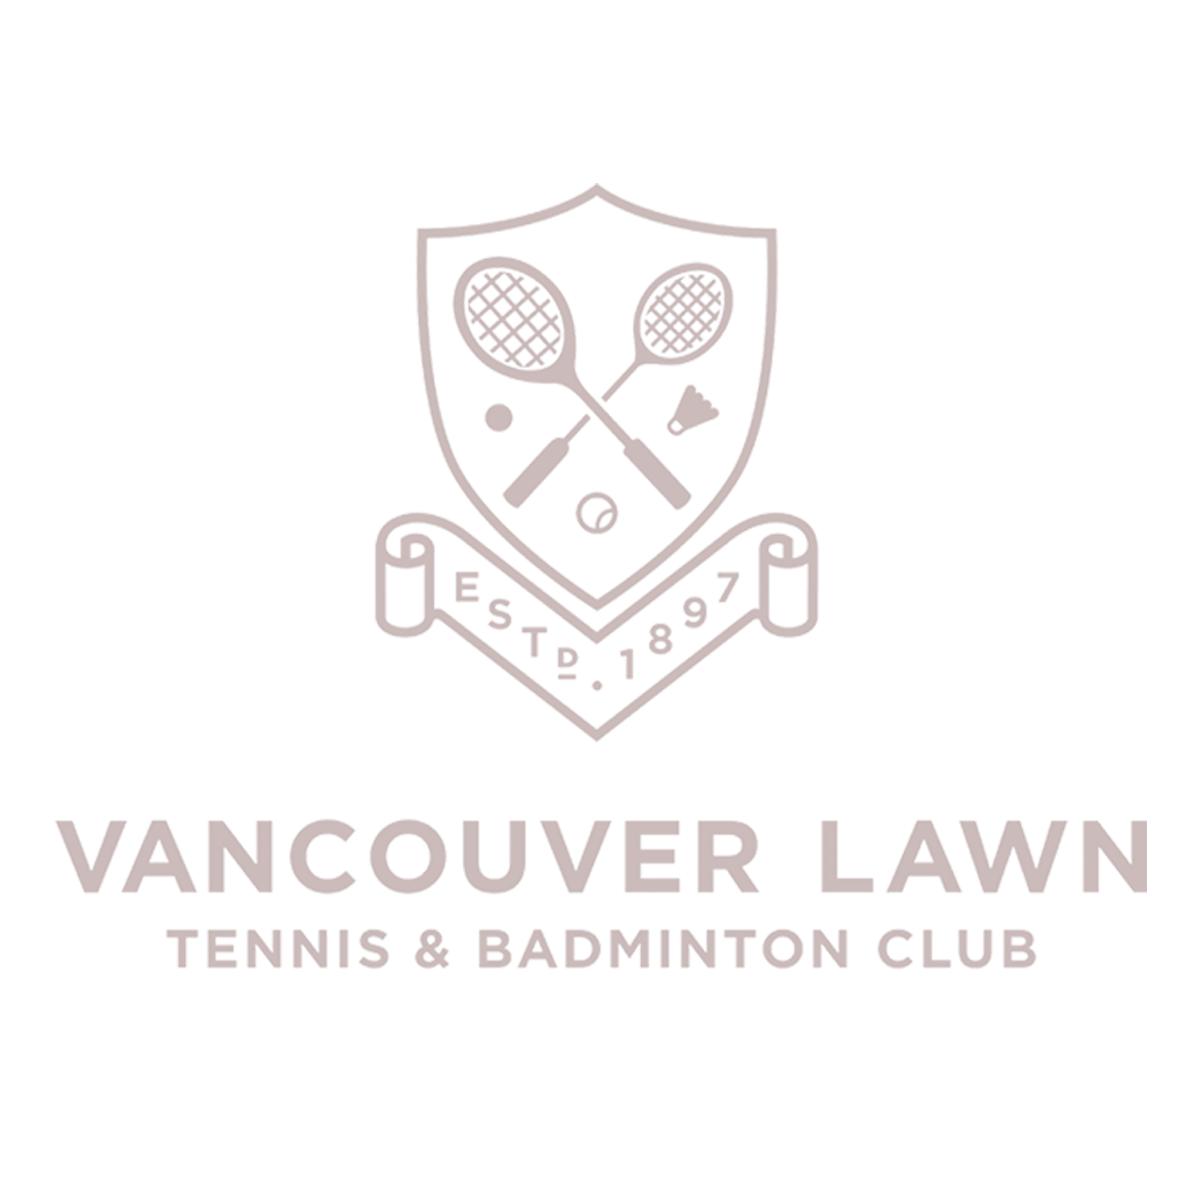 Van lawn logo squared.png